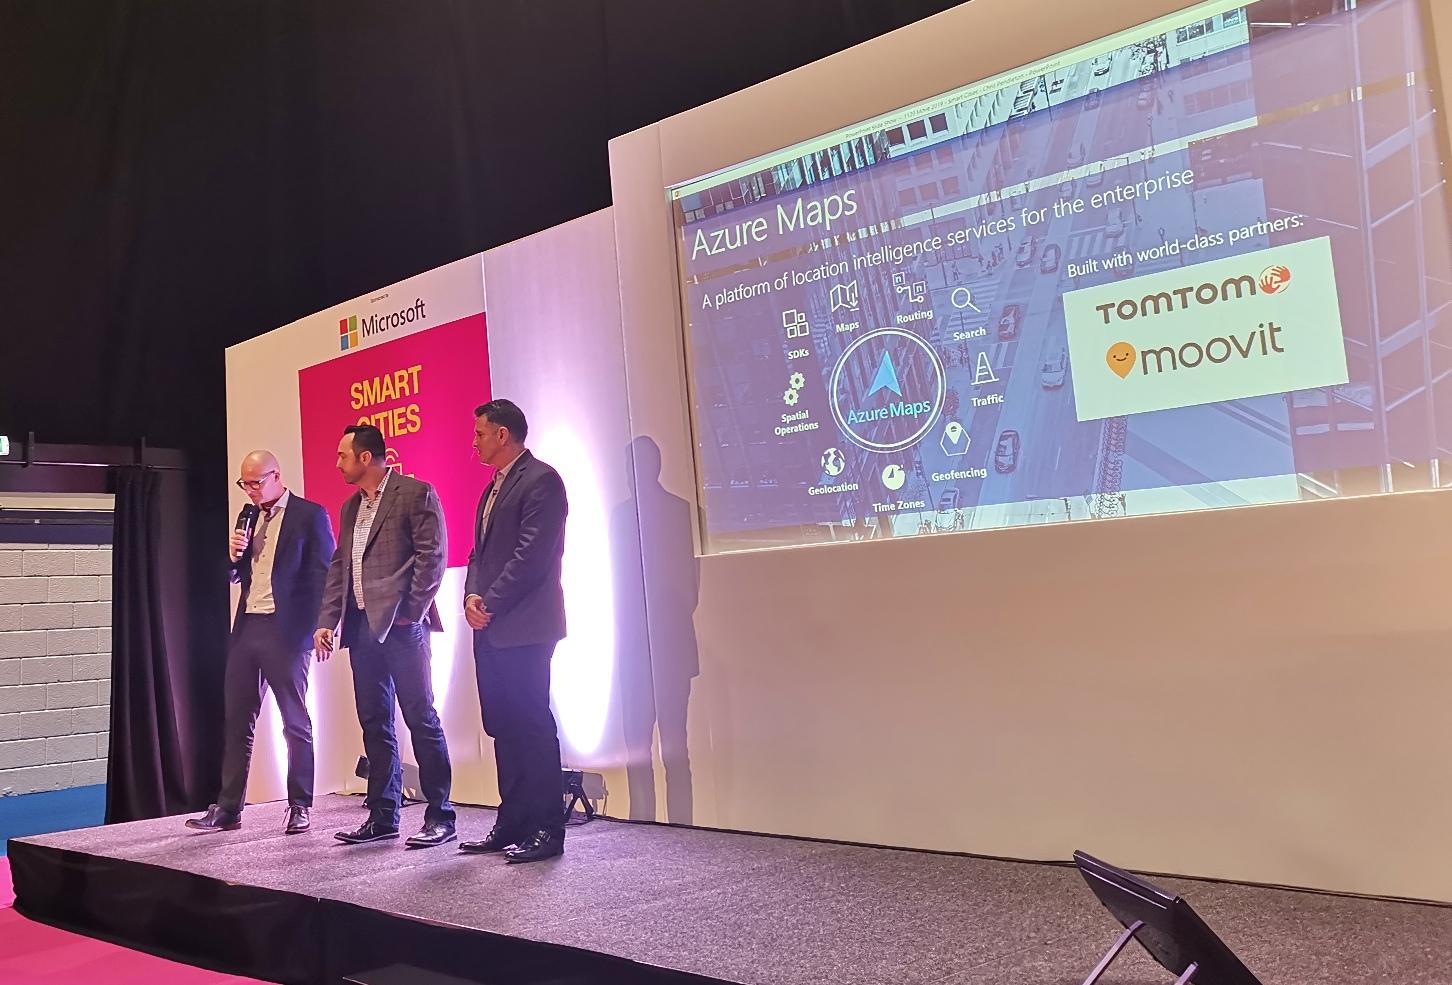 Microsoft, Moovit, and TomTom team up for multi-modal transport platform